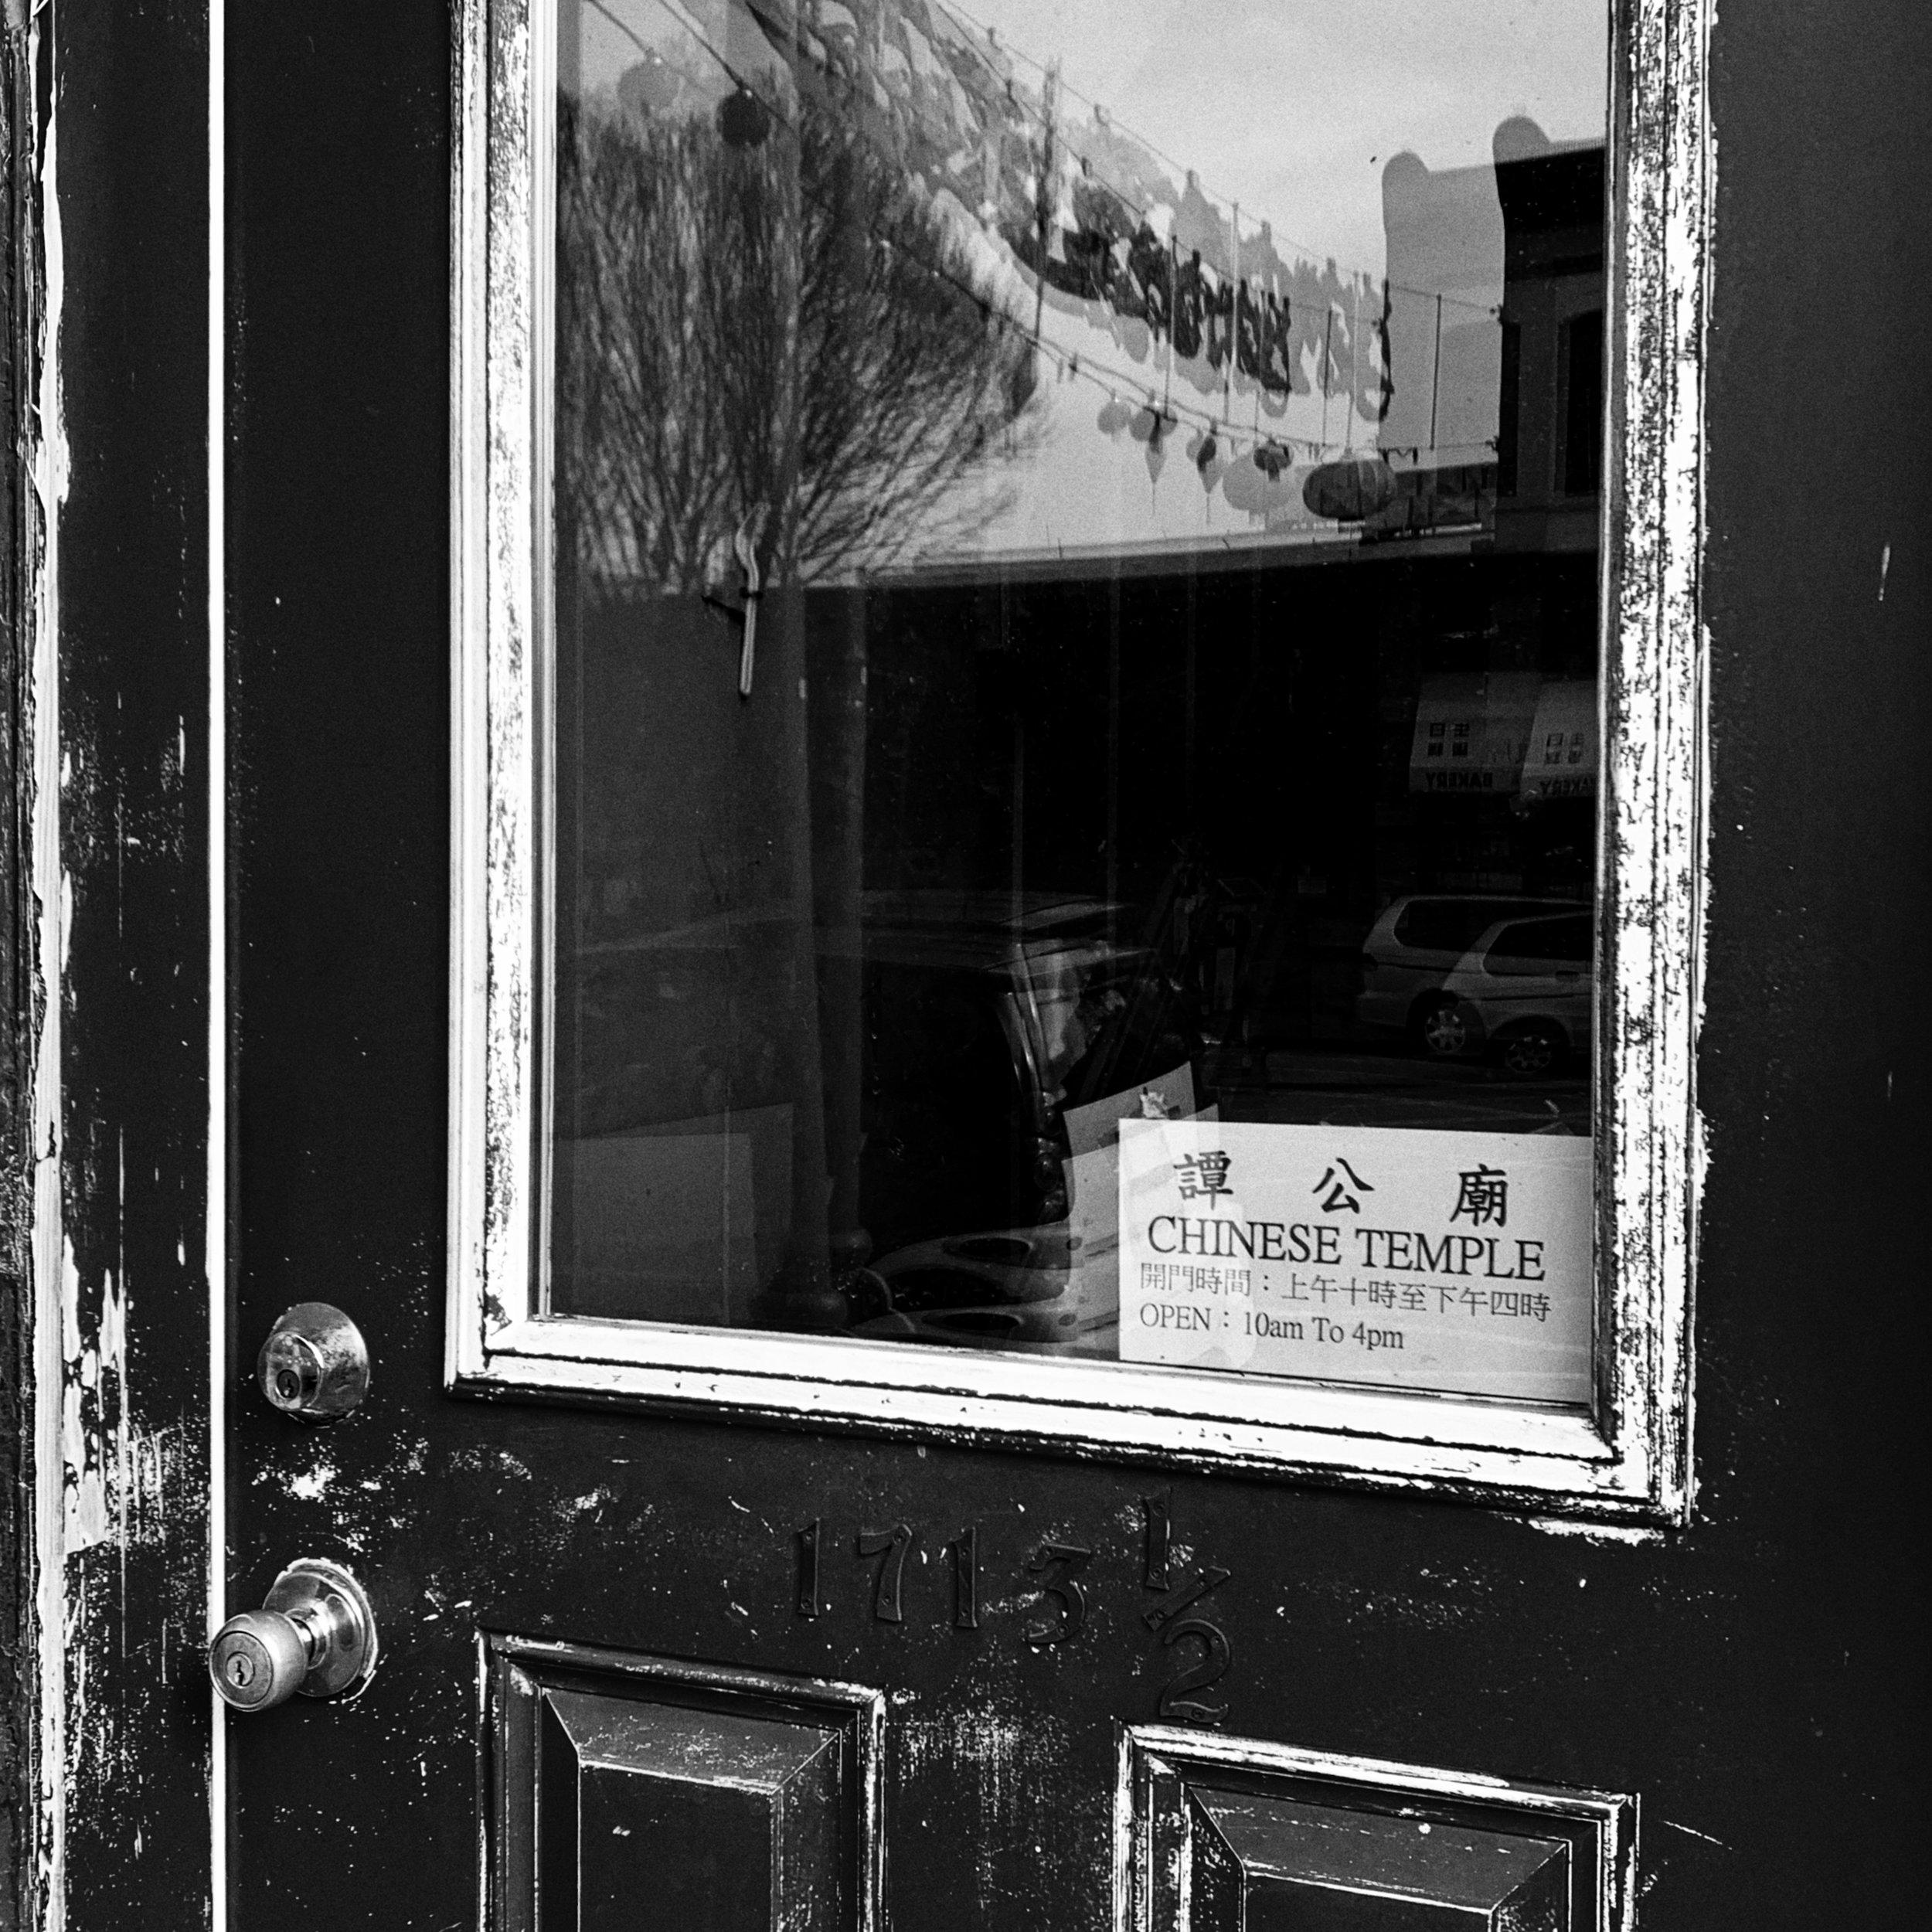 Chinese Temple Door, Chinatown, Victoria, BC